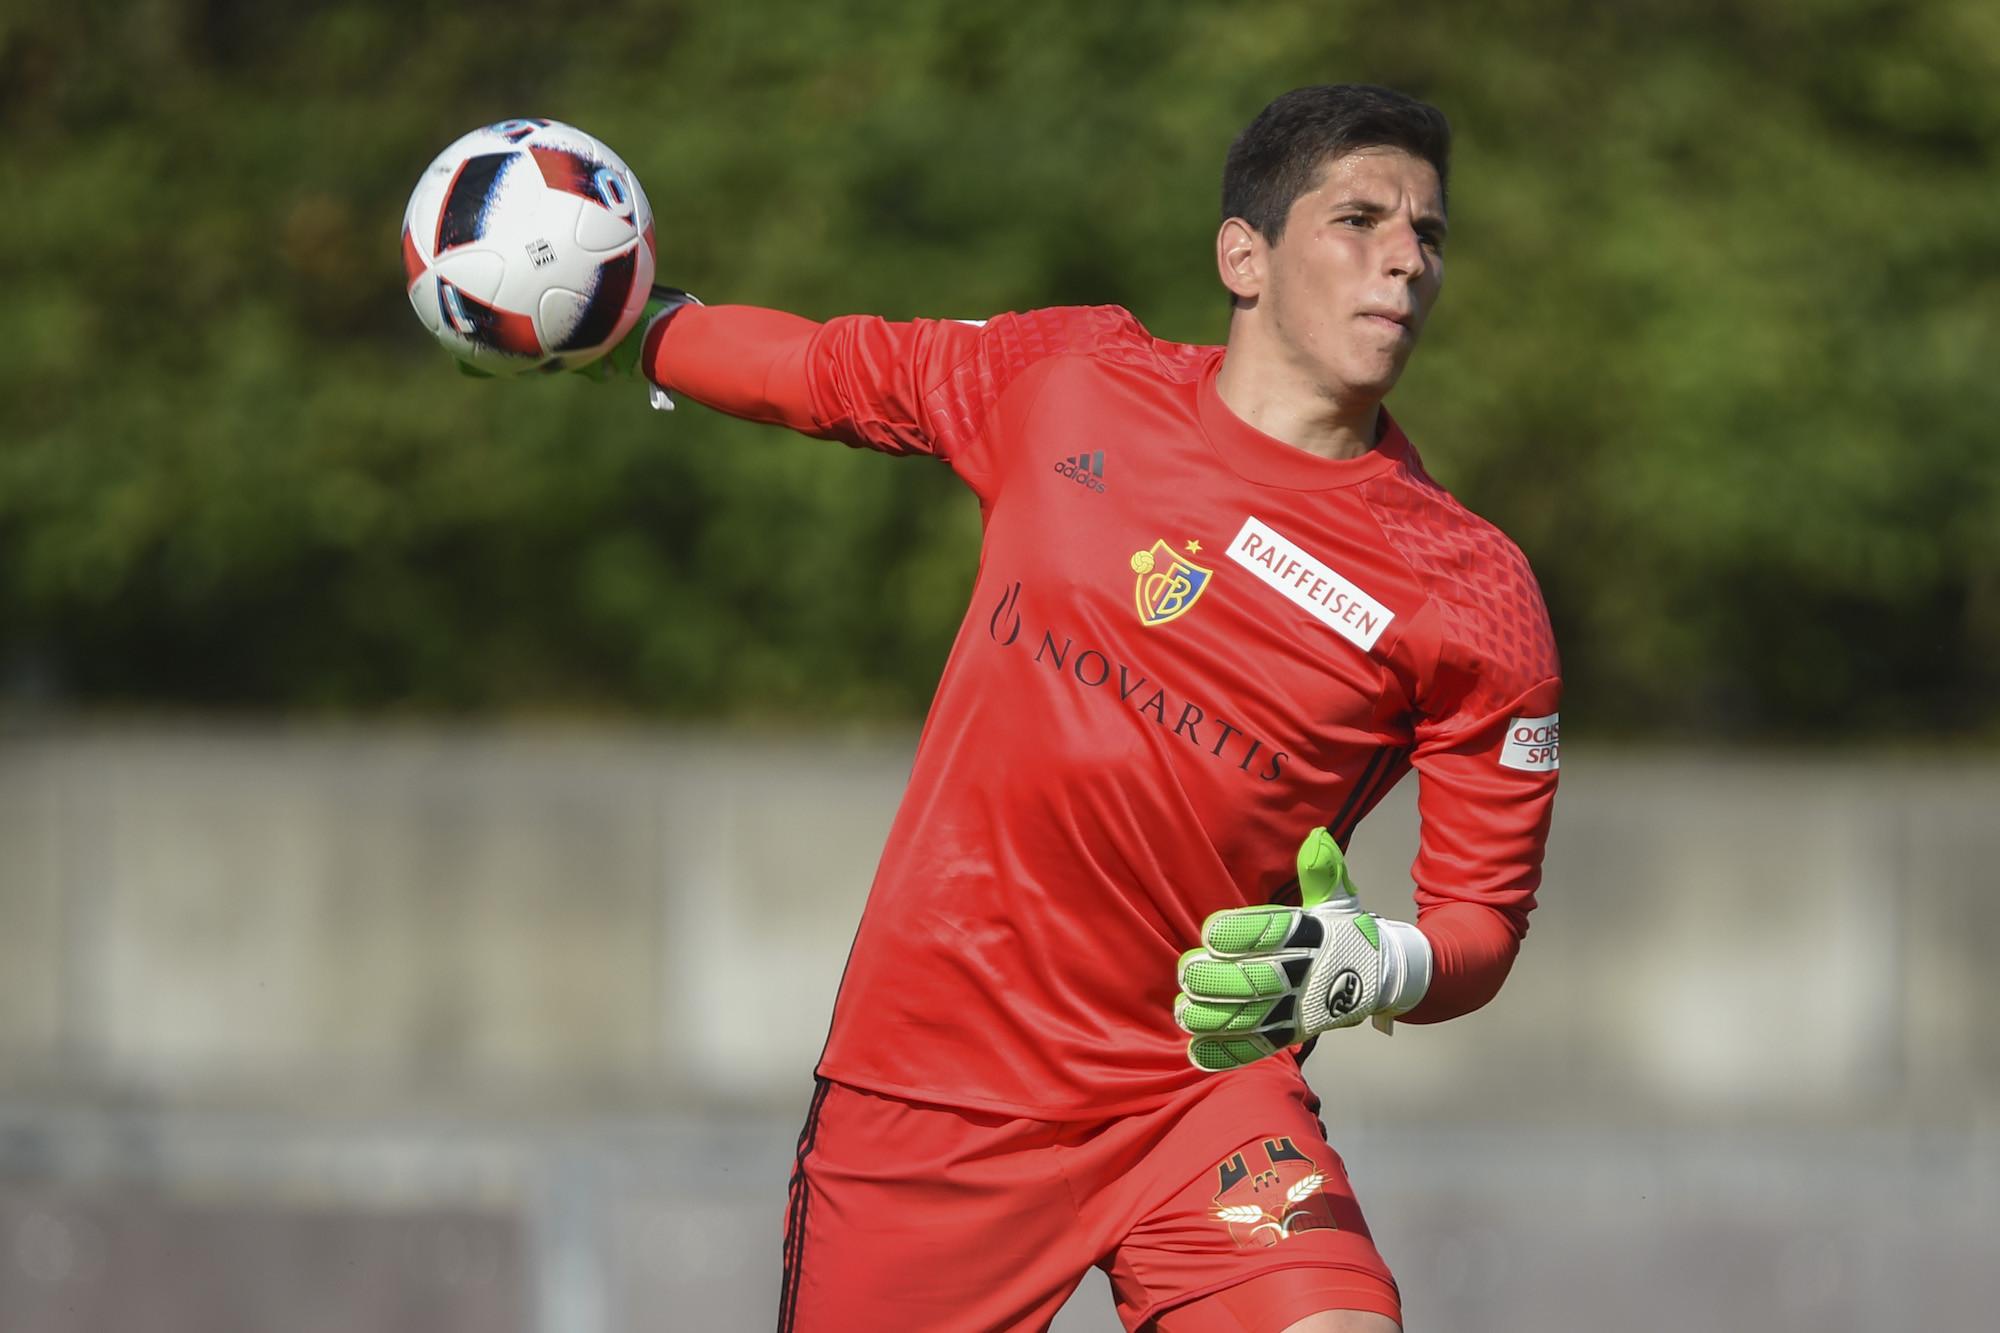 01.07.2016; Geretsried; Fussball - TSV 1860 Muenchen - FC Basel; Torhueter Djordje Nikolic (Basel) (Andy Mueller/freshfocus